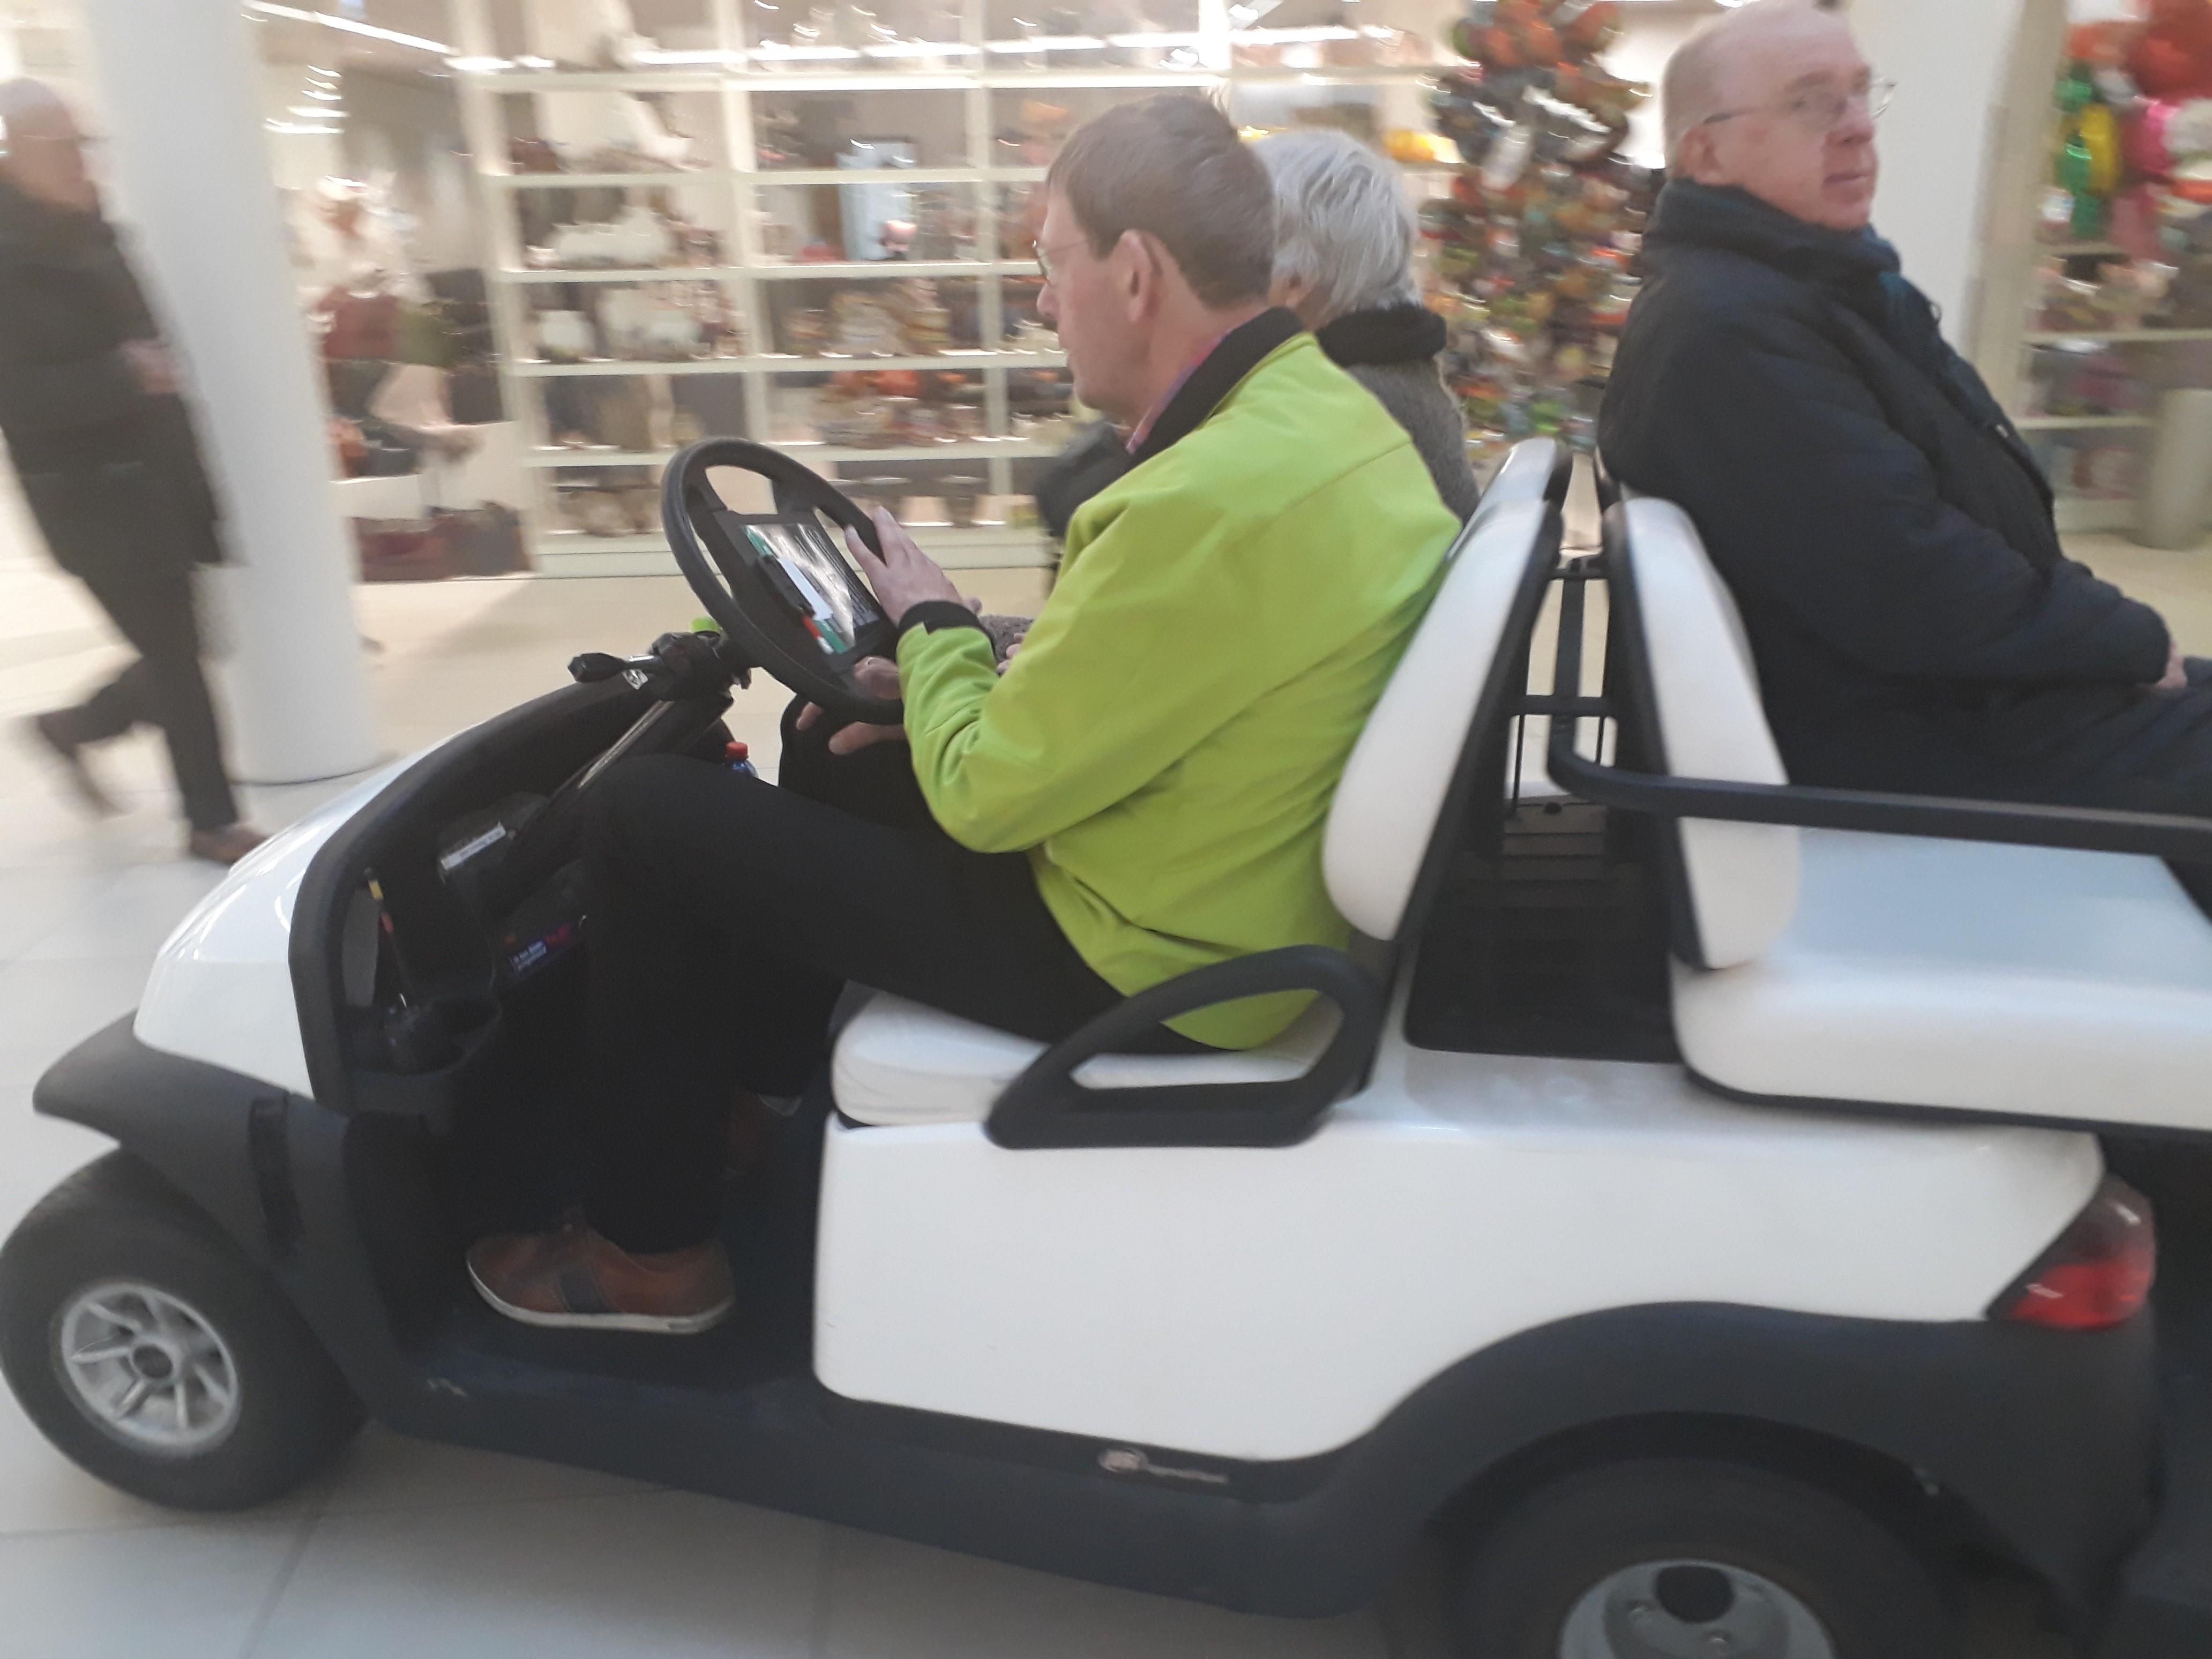 Vrijwilliger op golfkar met patiënten